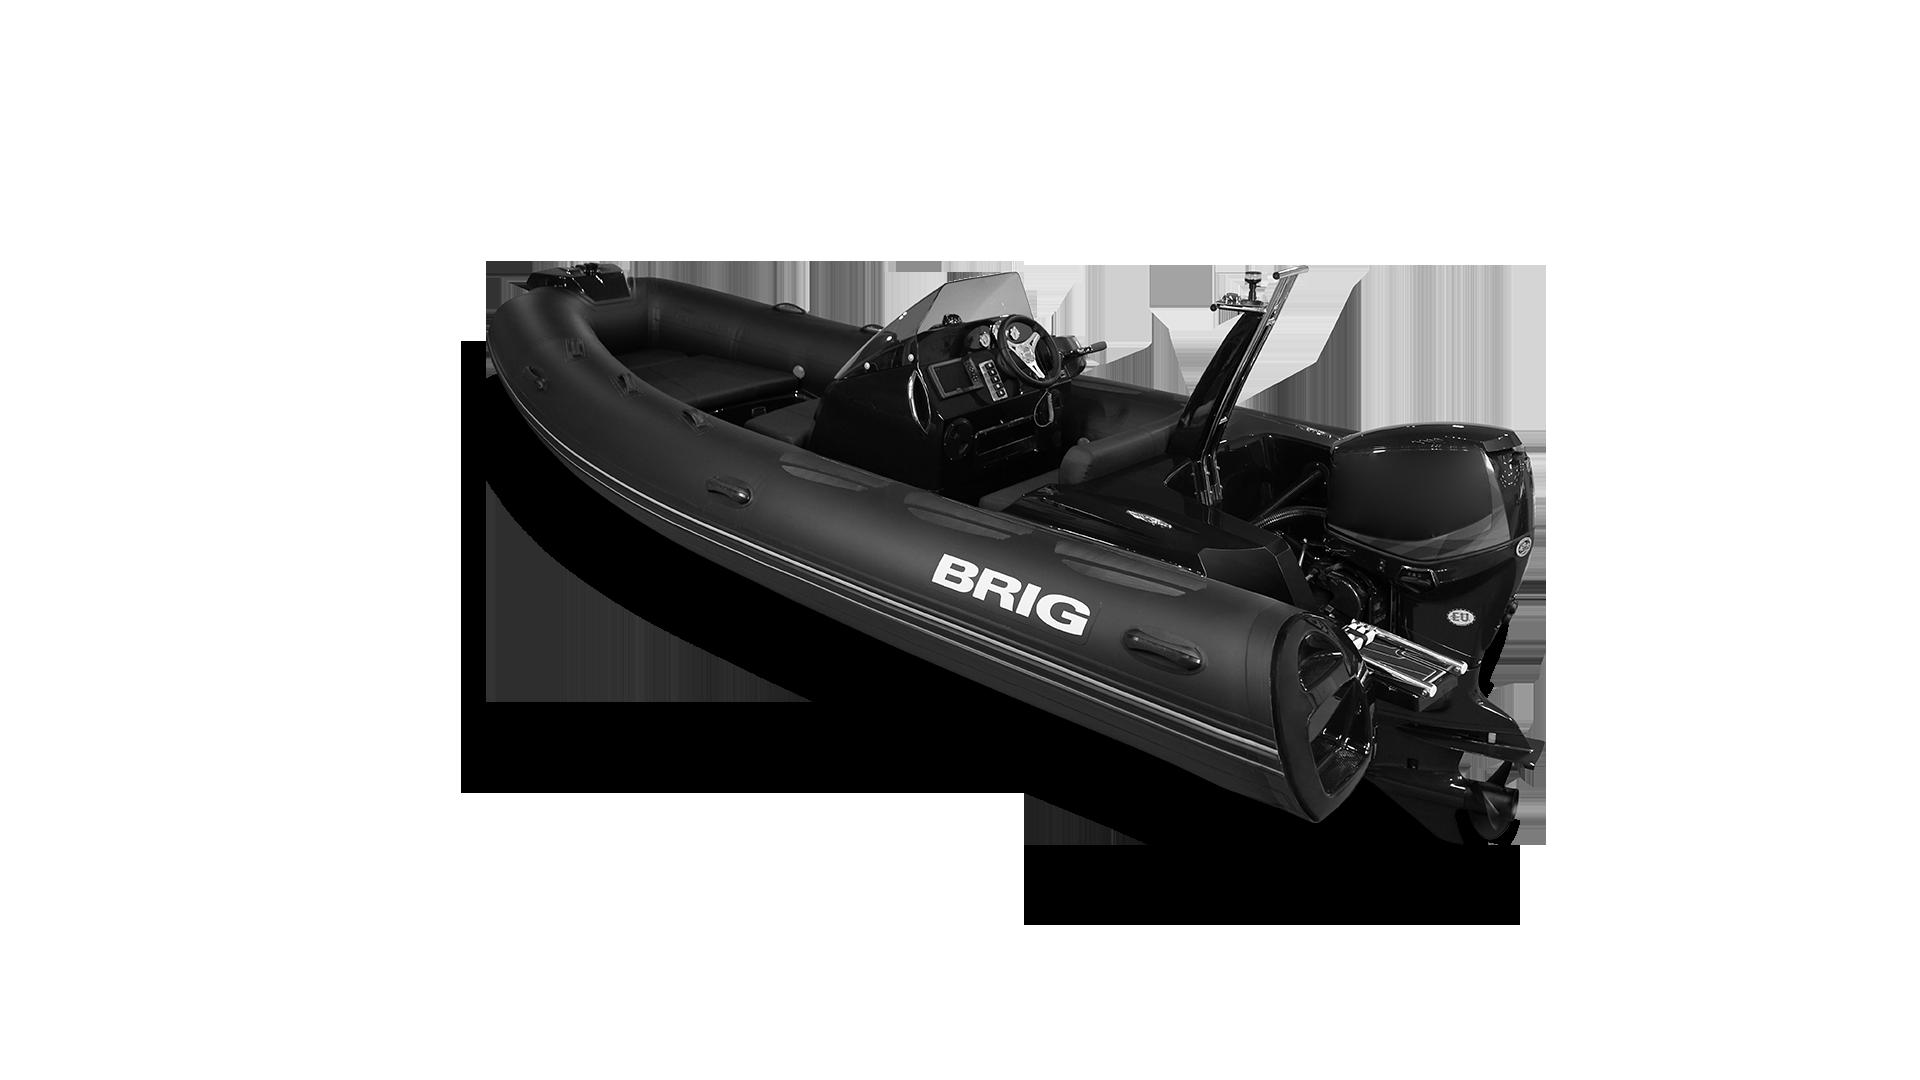 Eagle 480 Rigid Inflatable Boat